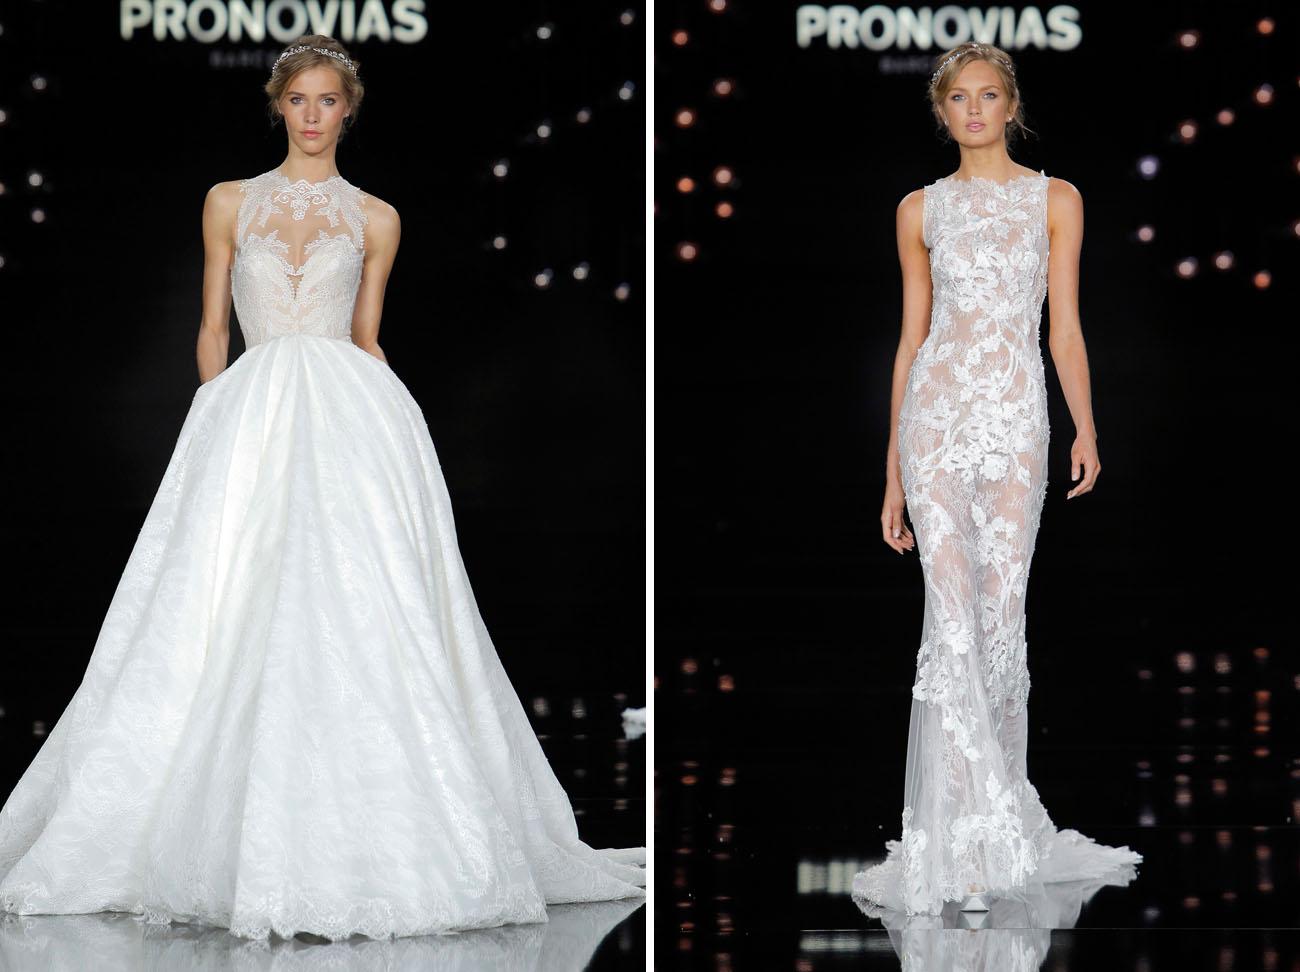 Pronovias Runway Show From Barcelona Bridal Week 2018: Pronovias Runway Show From Barcelona Bridal Week 2016